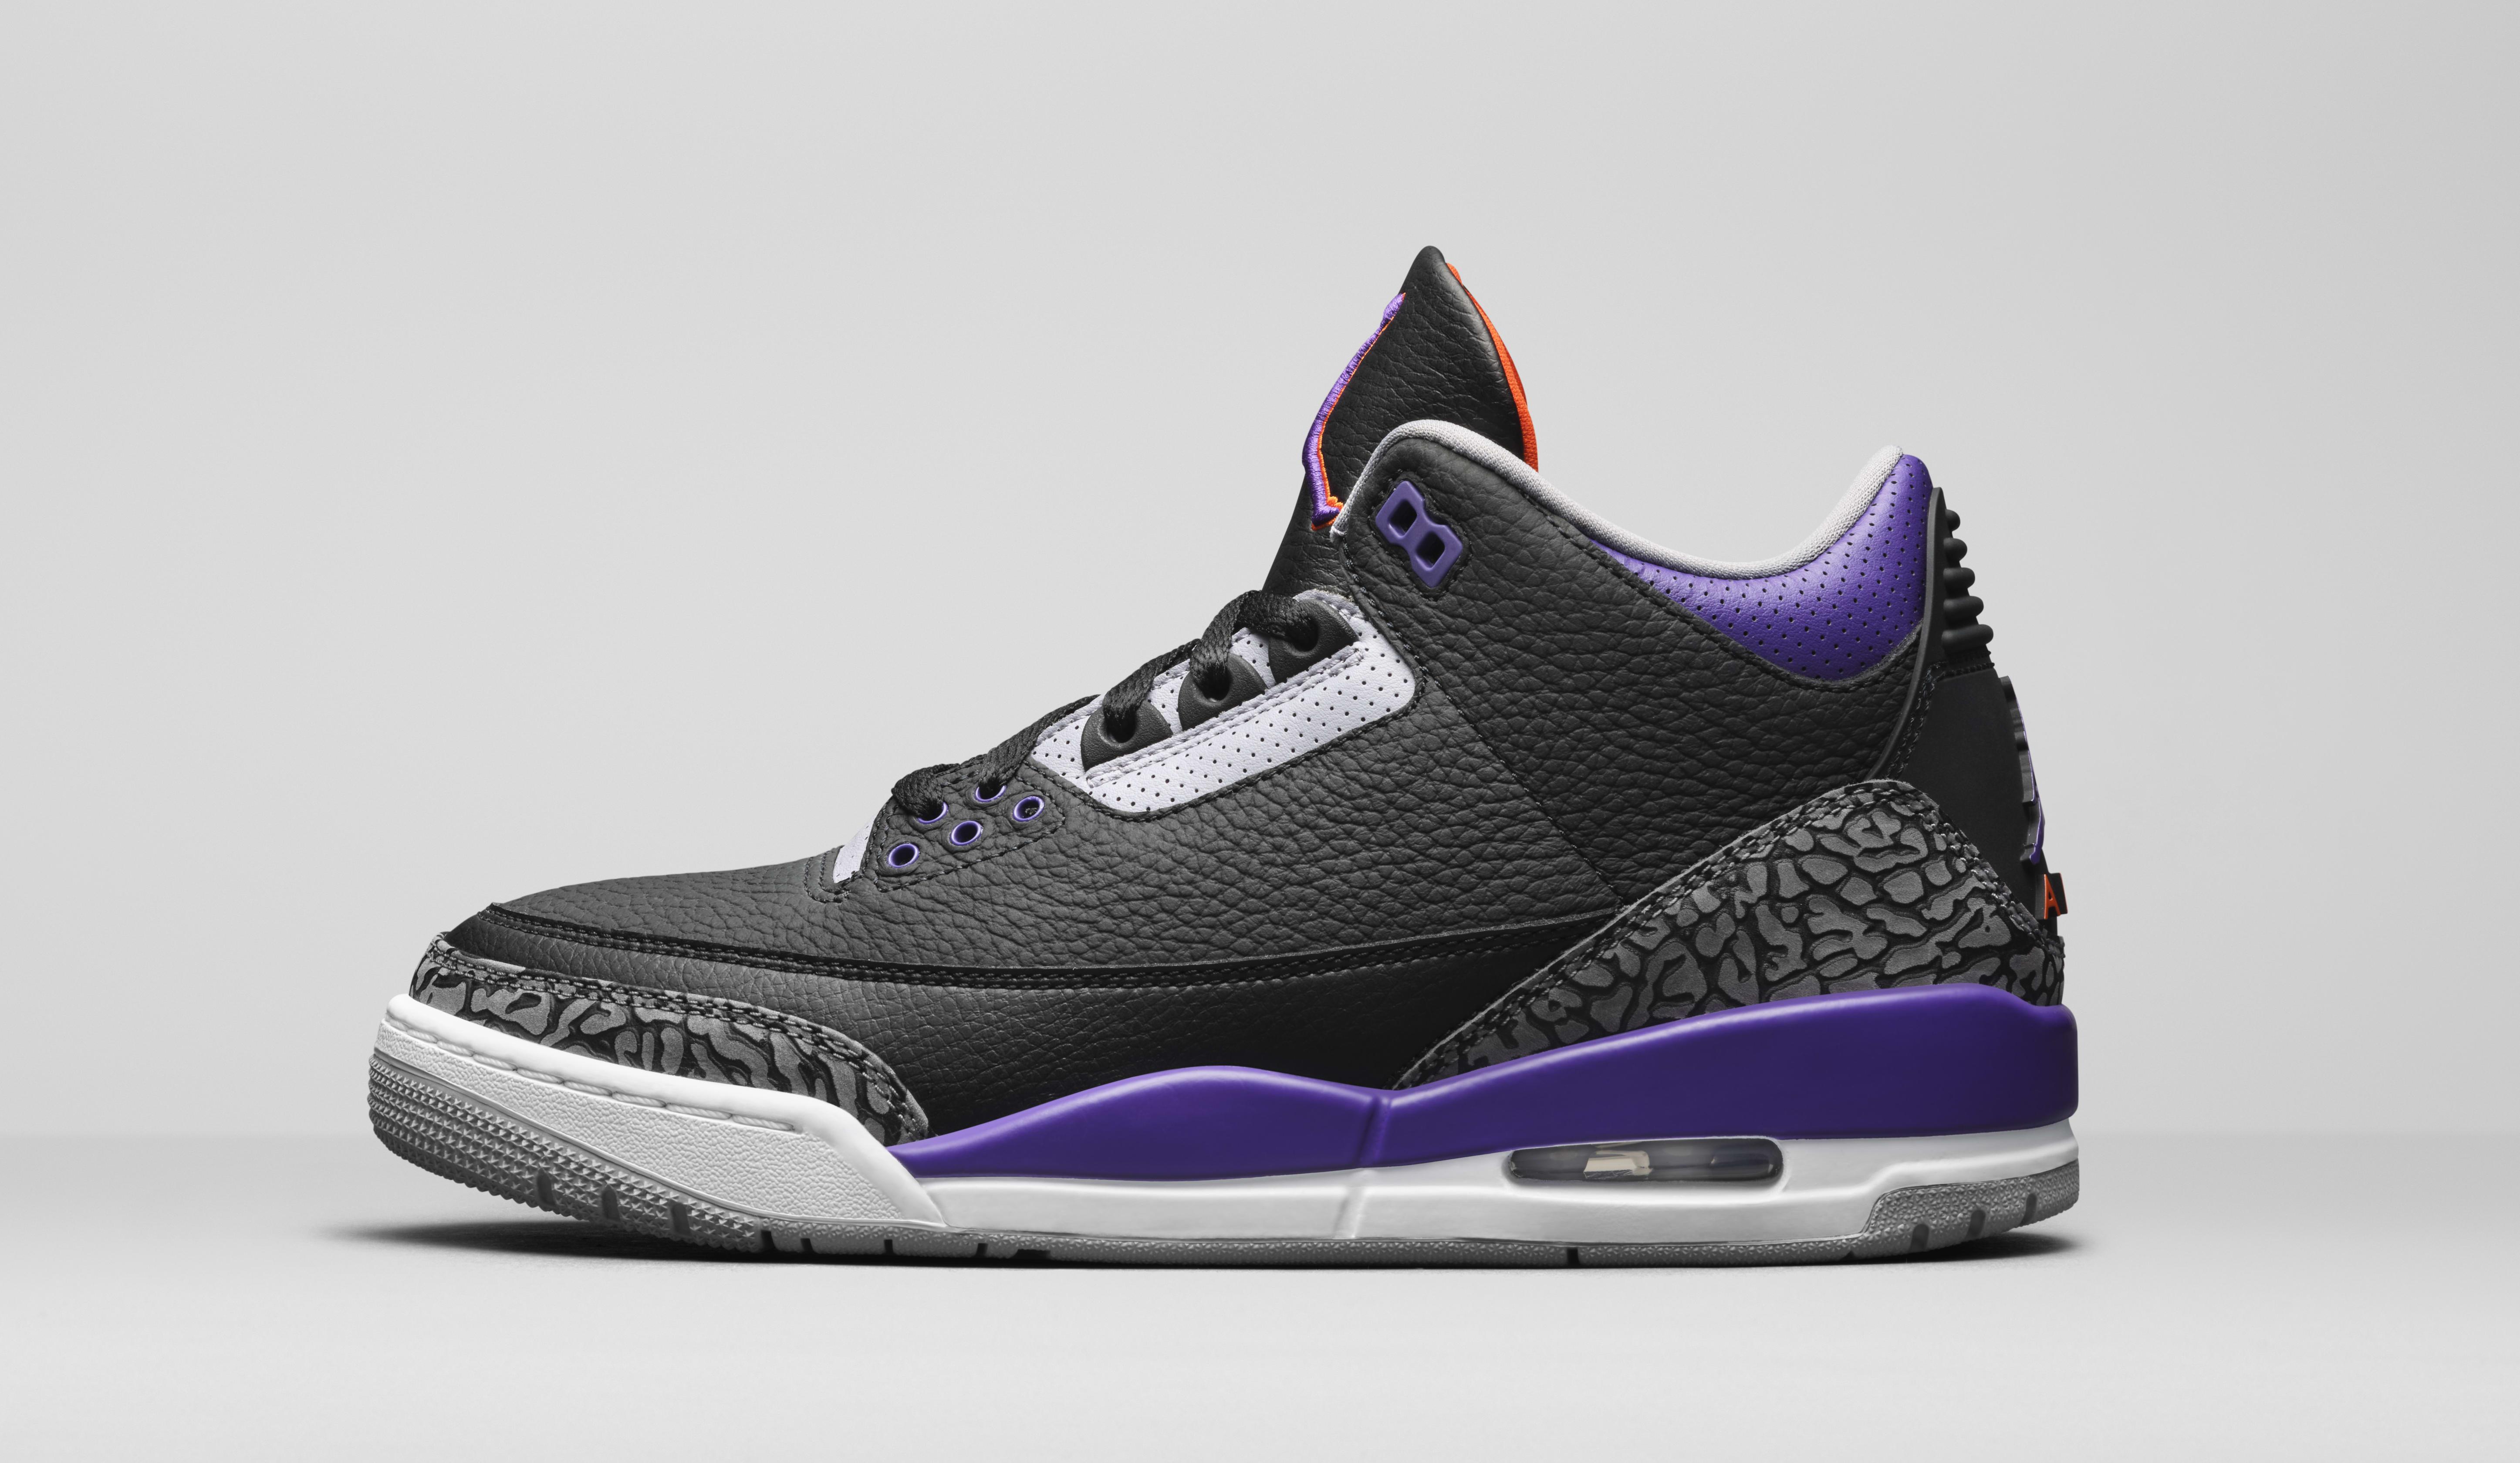 Air Jordan 3 Retro 'Court Purple' CT8532-050 Lateral